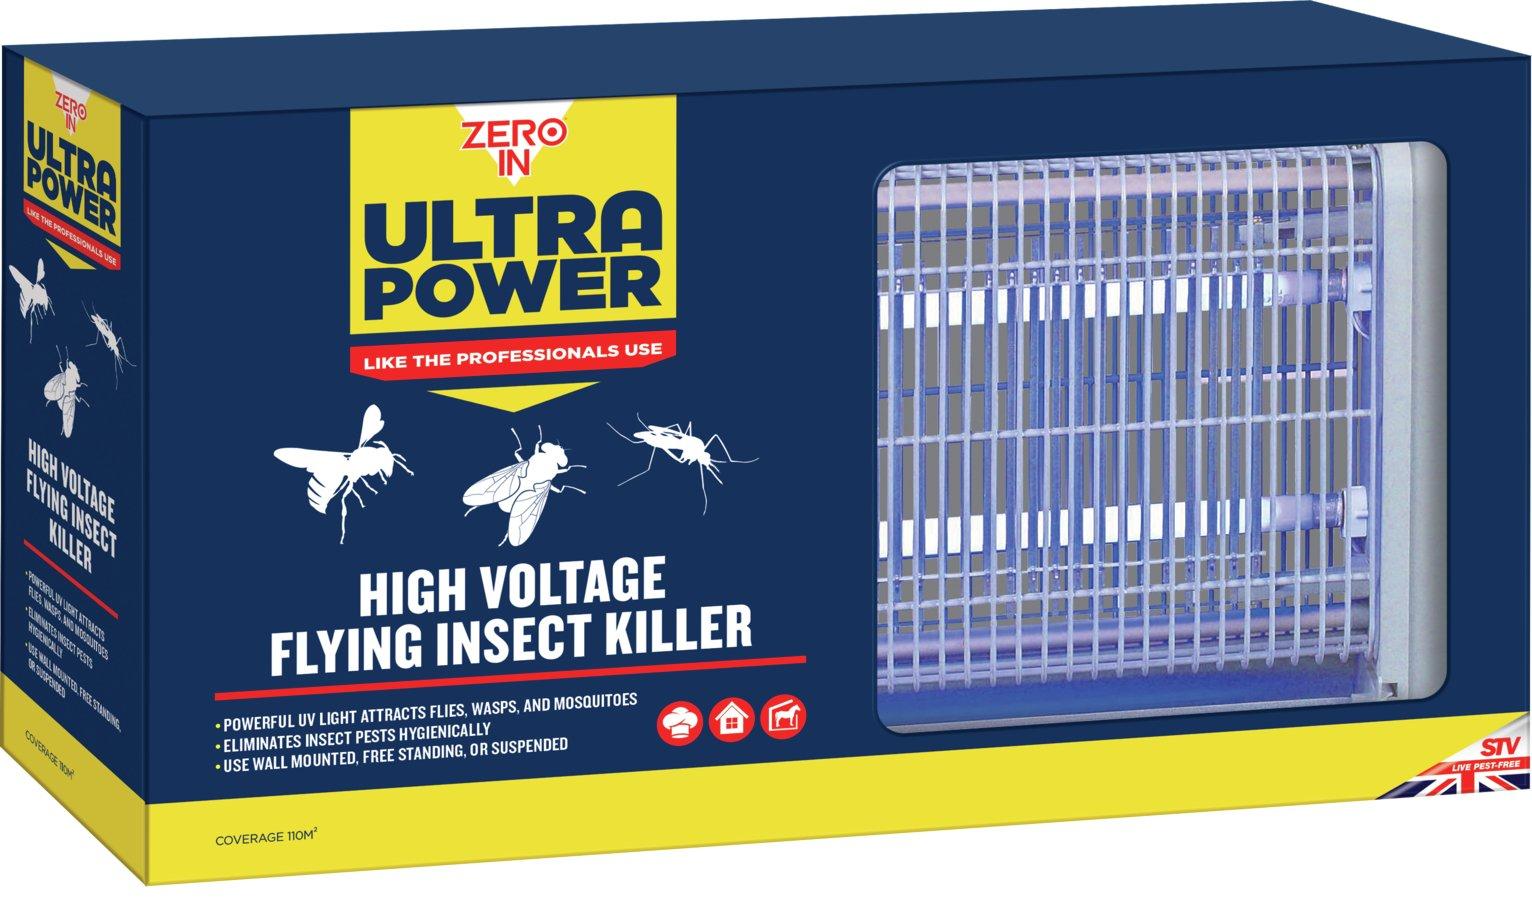 Zero In Ultra Power UV Light Insect Killer